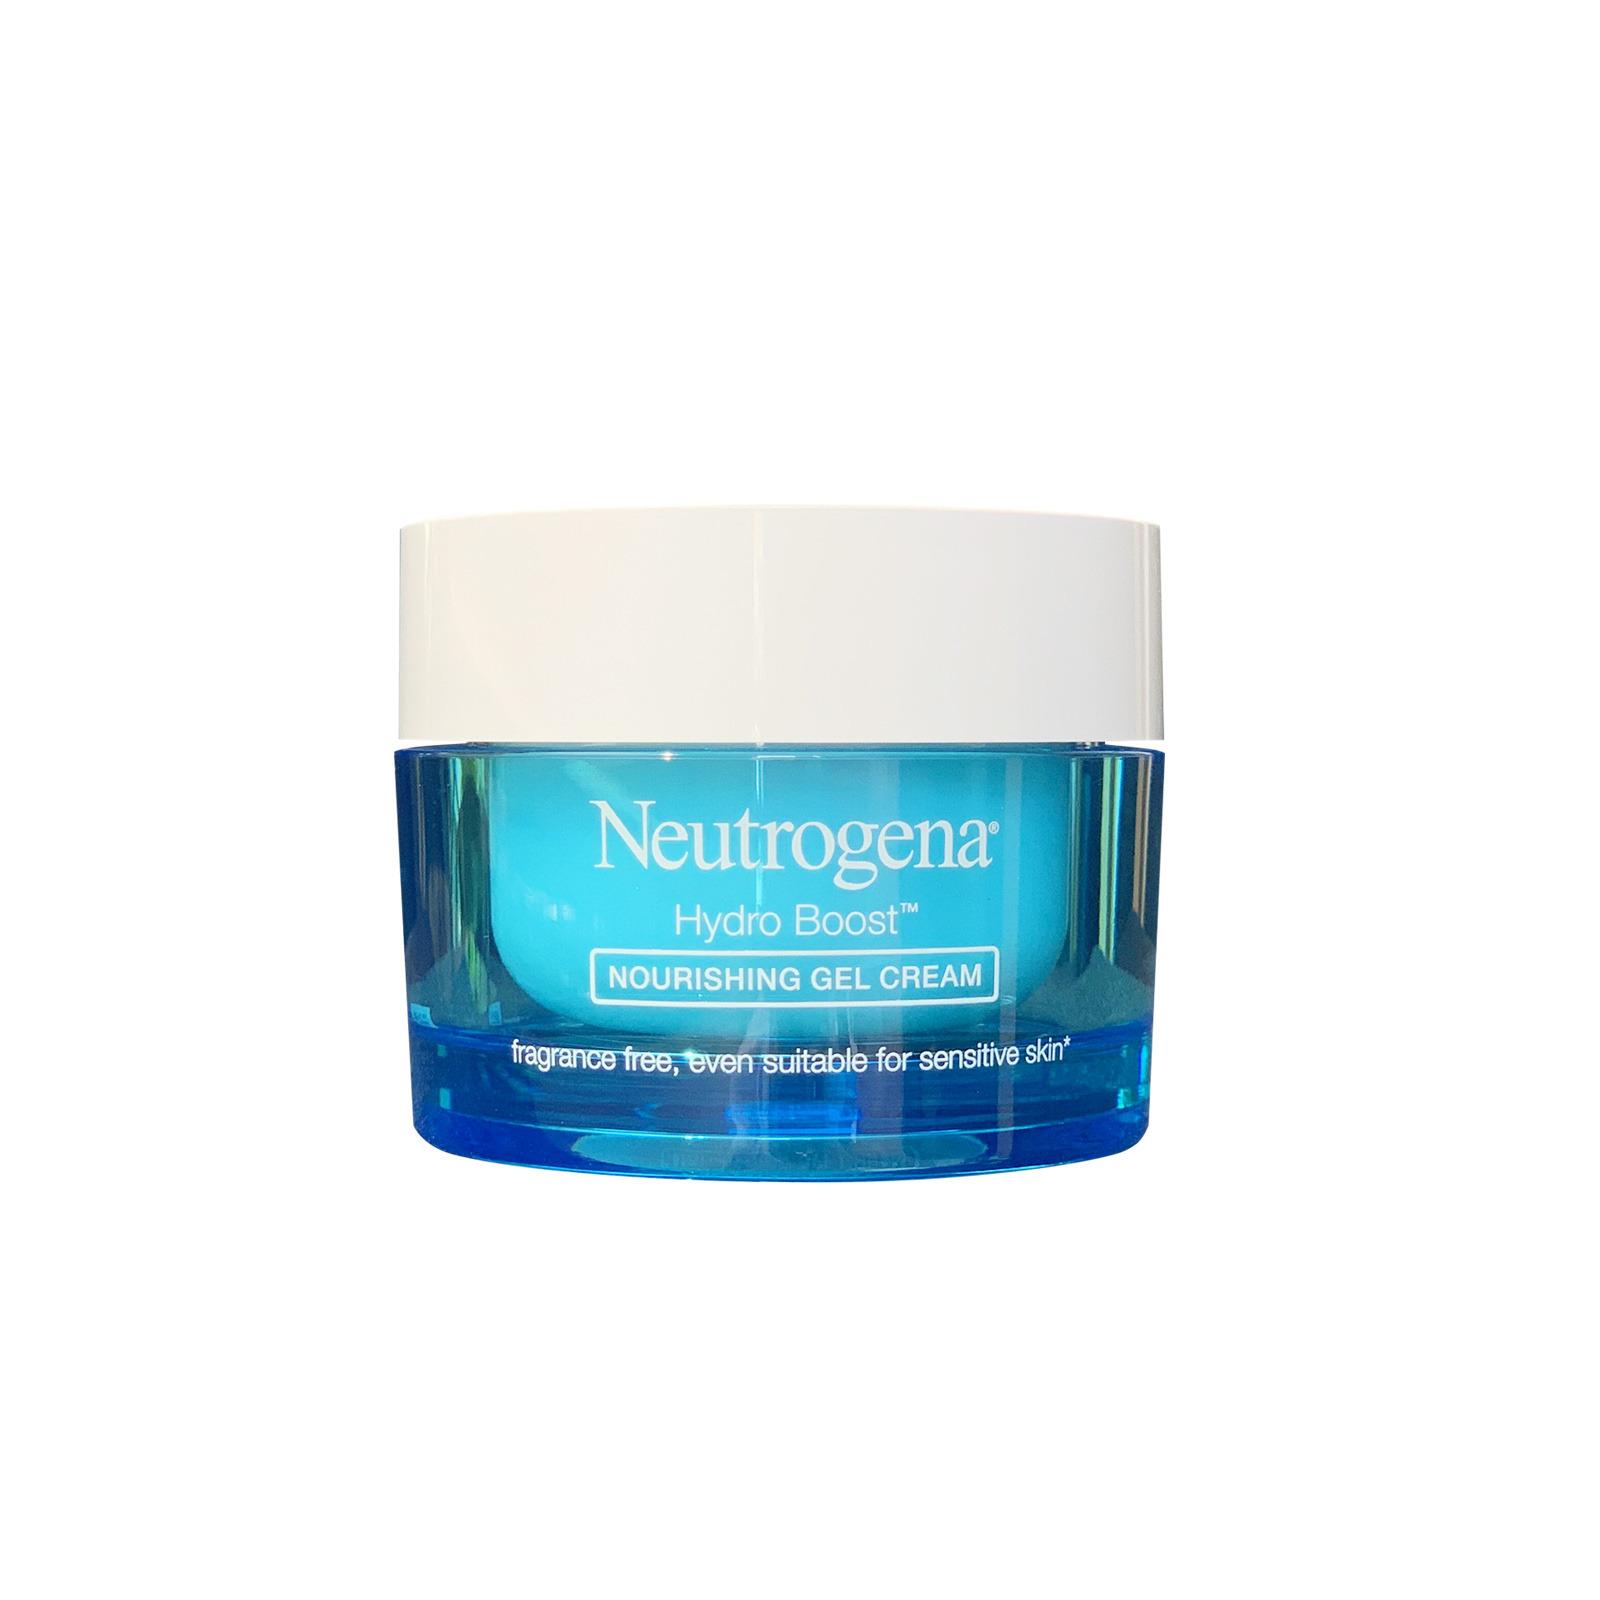 Neutrogena® Hydro Boost™ Nourishing Gel Cream 50g